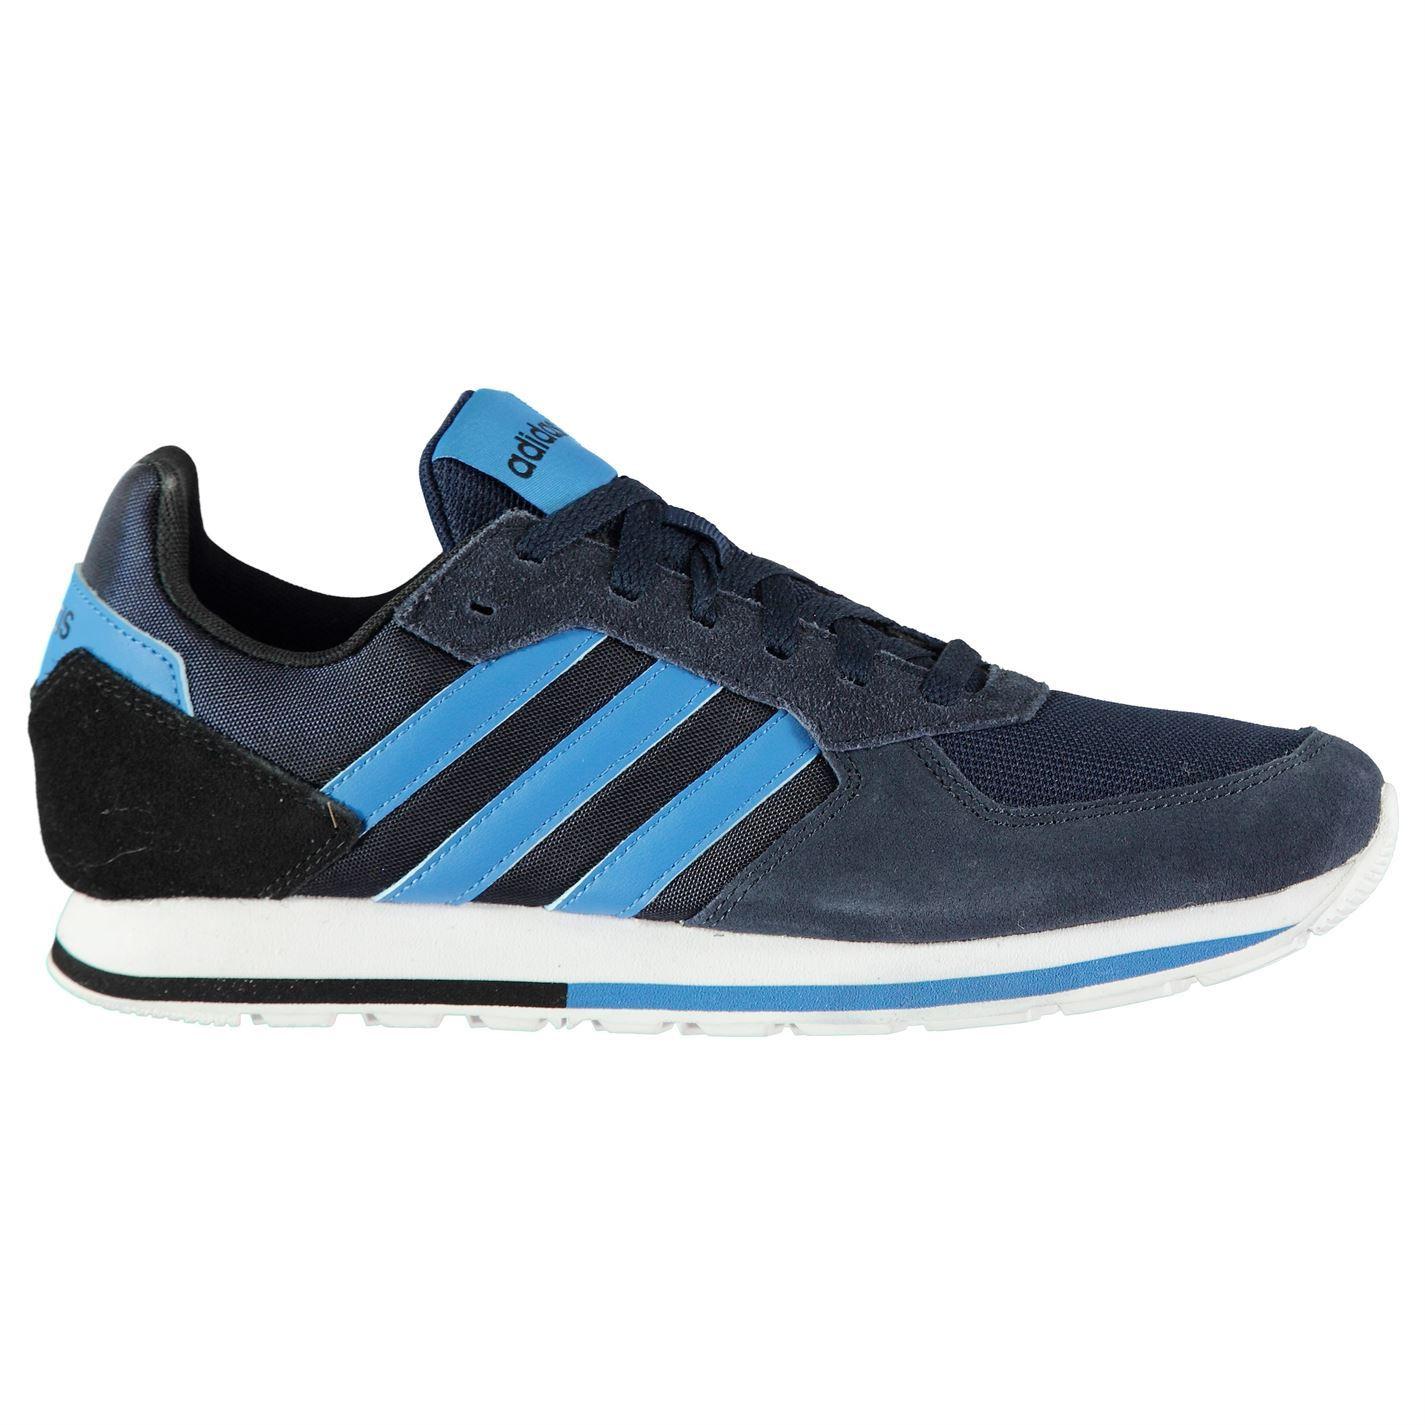 Adidas  Uomo 8K Trainers Runners Runners Trainers b52f8d